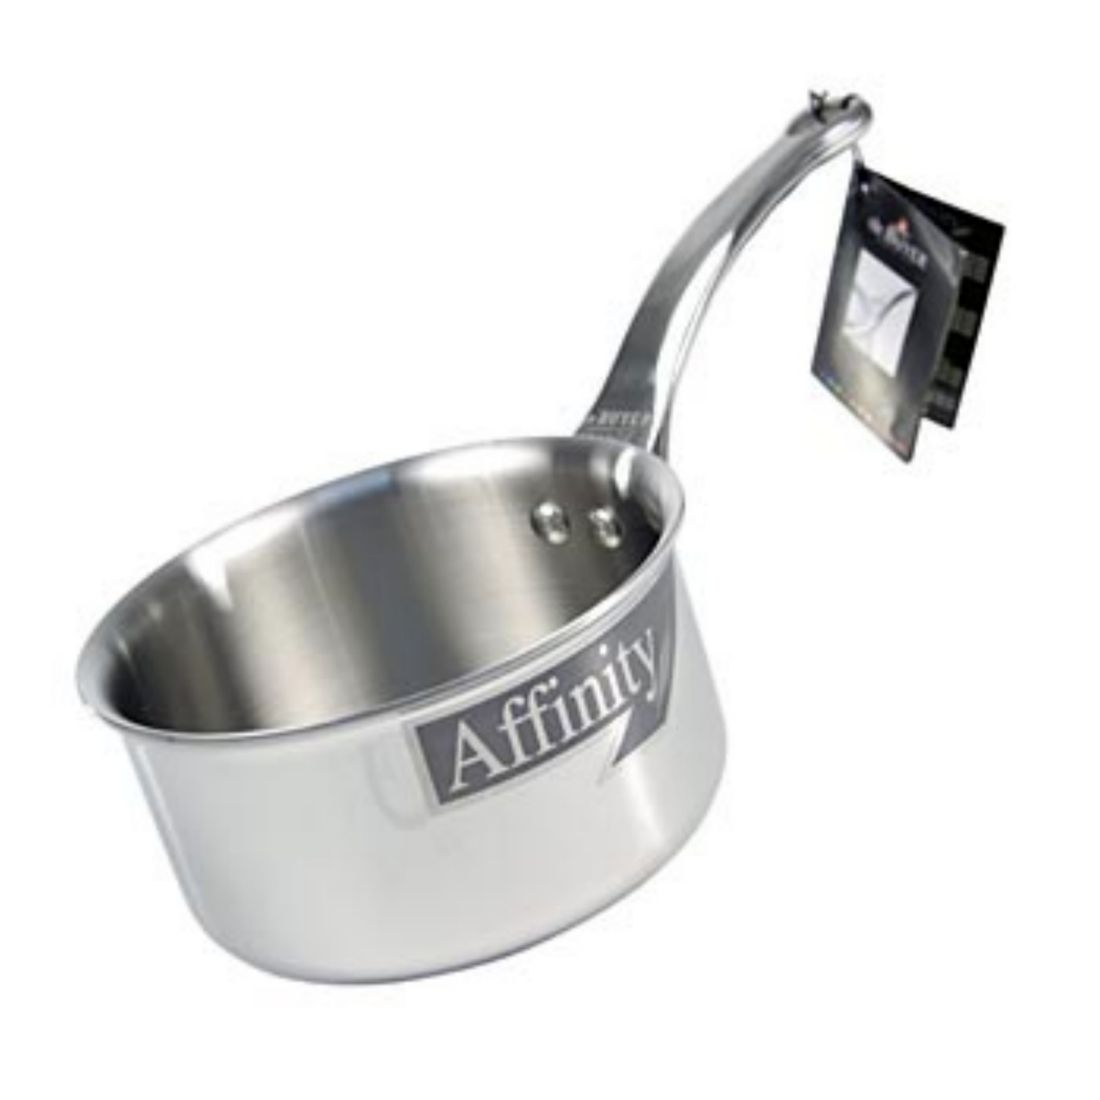 Rendlík Affinity 1,8 l